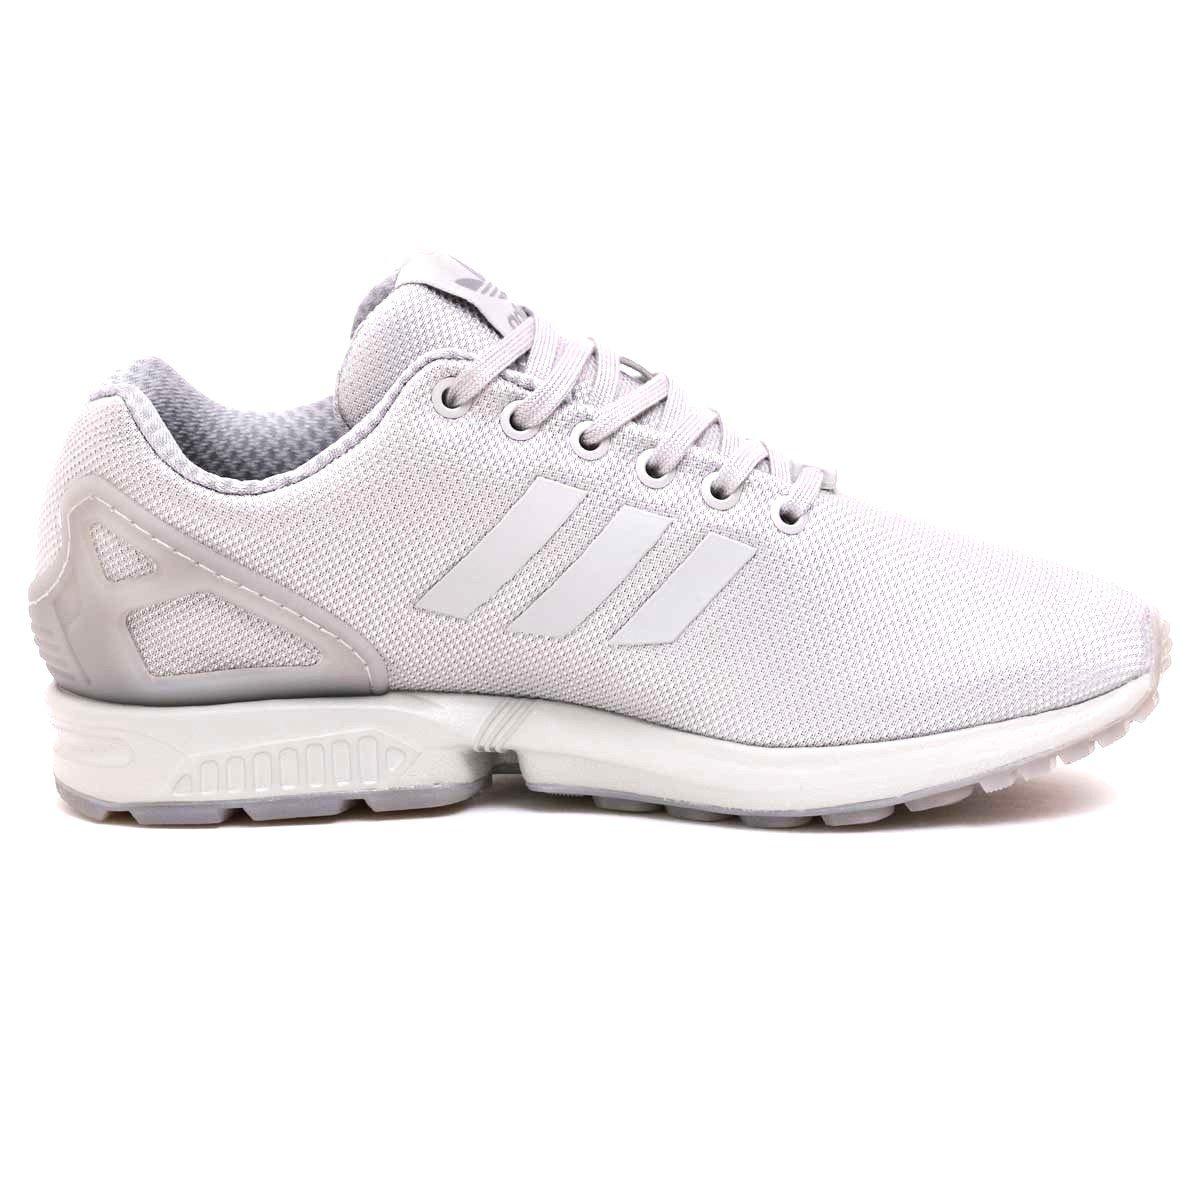 competitive price 3a420 c197e adidas Originals Men's ZX Flux Running Shoe (10.5, Grey/Grey/Grey)